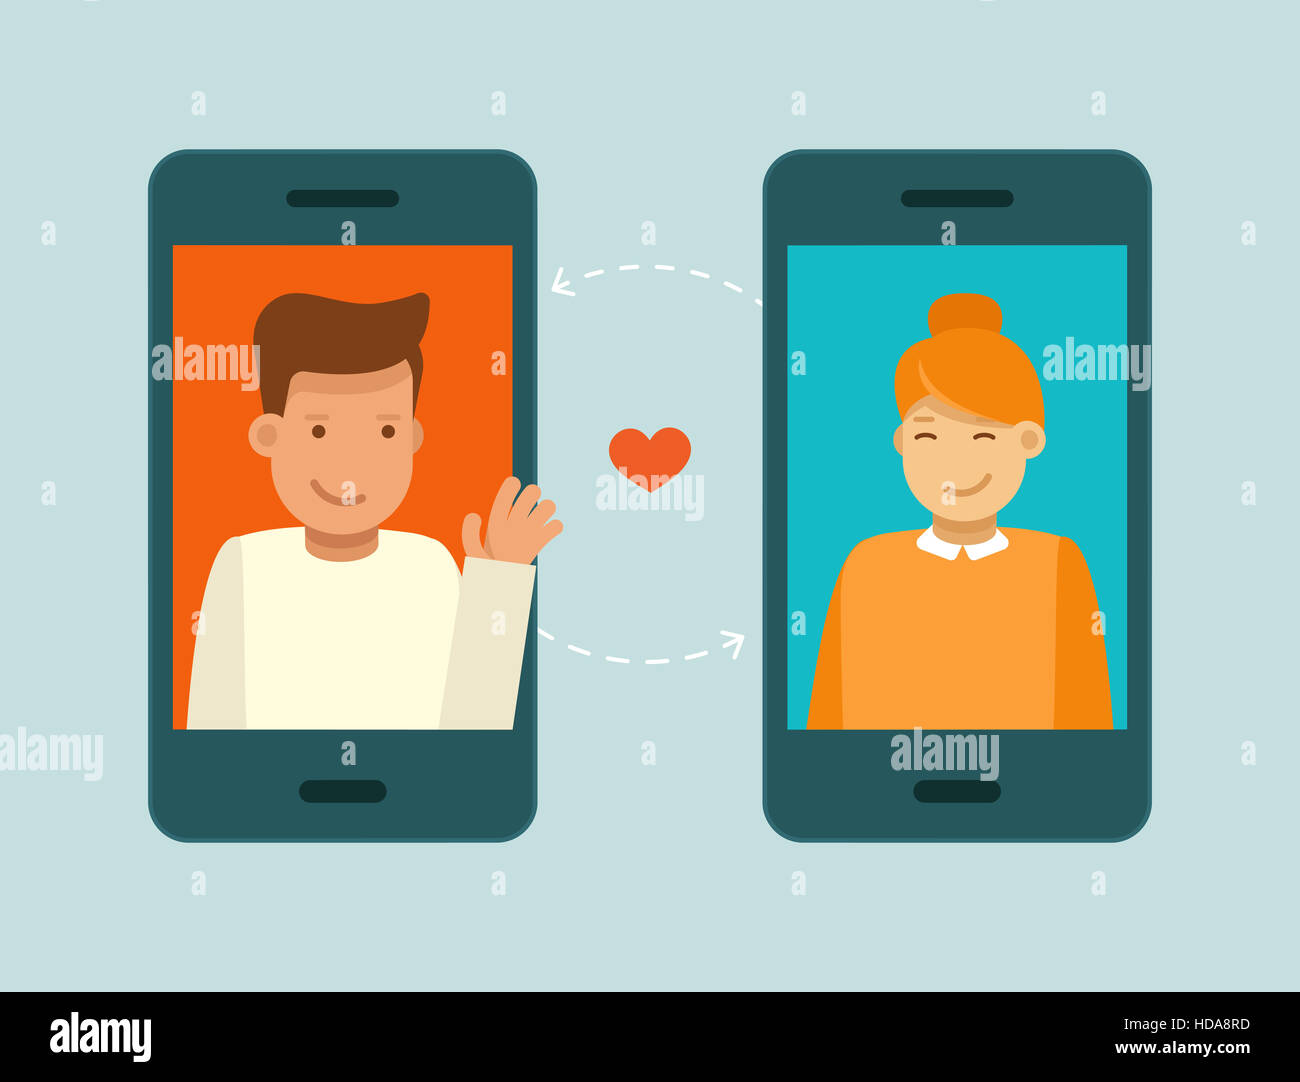 Nightline dating app